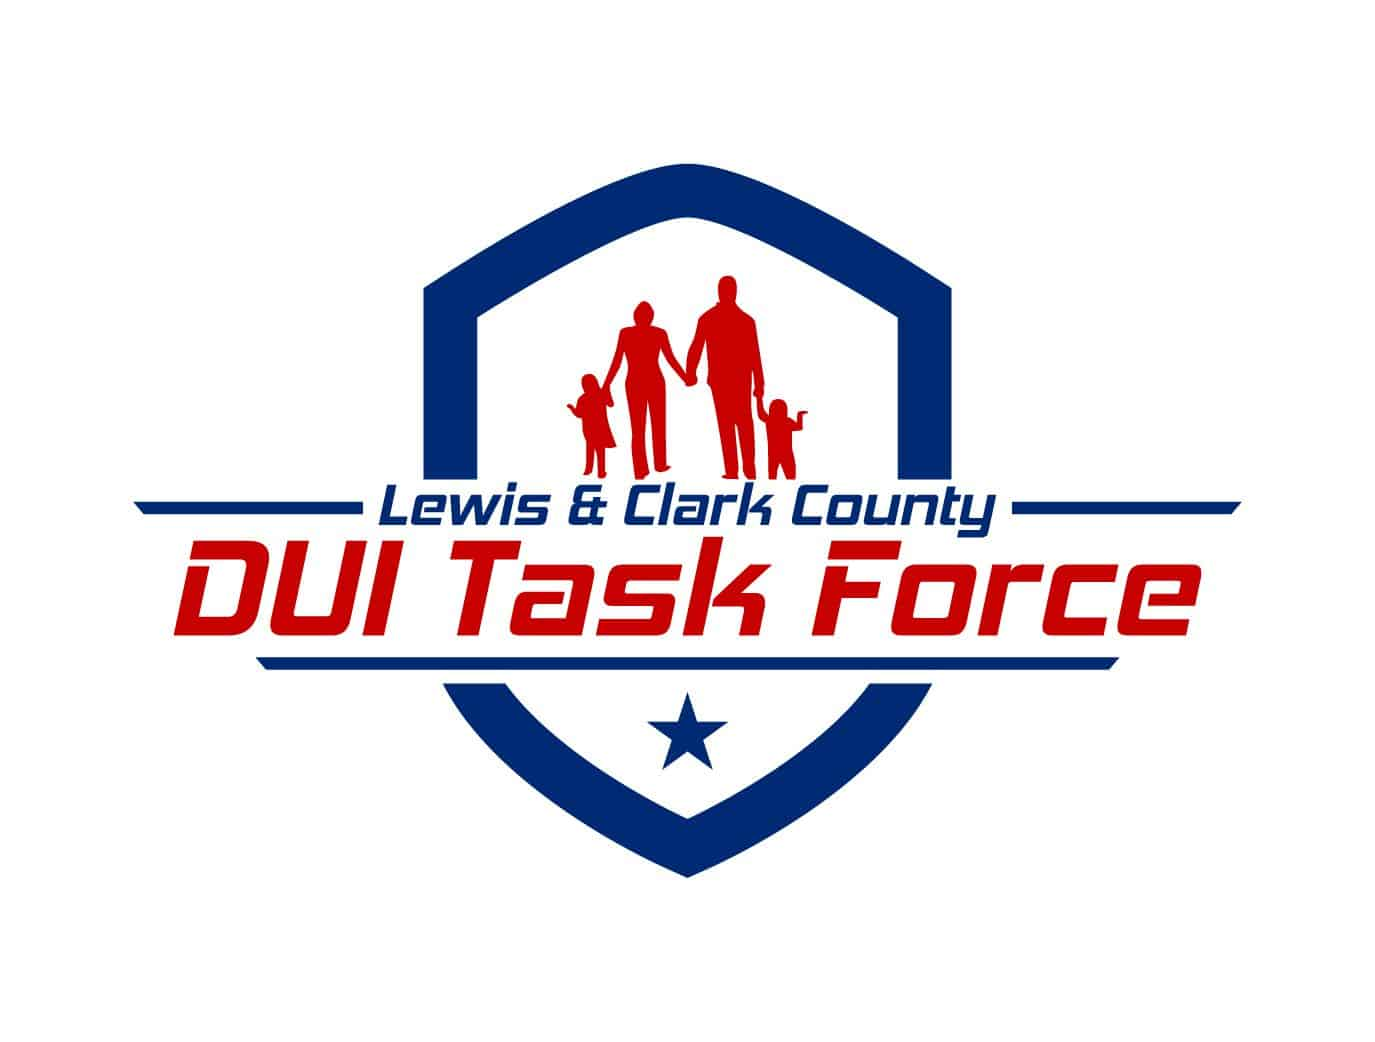 https://duiprevention.org/wp-content/uploads/2021/09/DUITaskForce_logo-vert-2.jpg